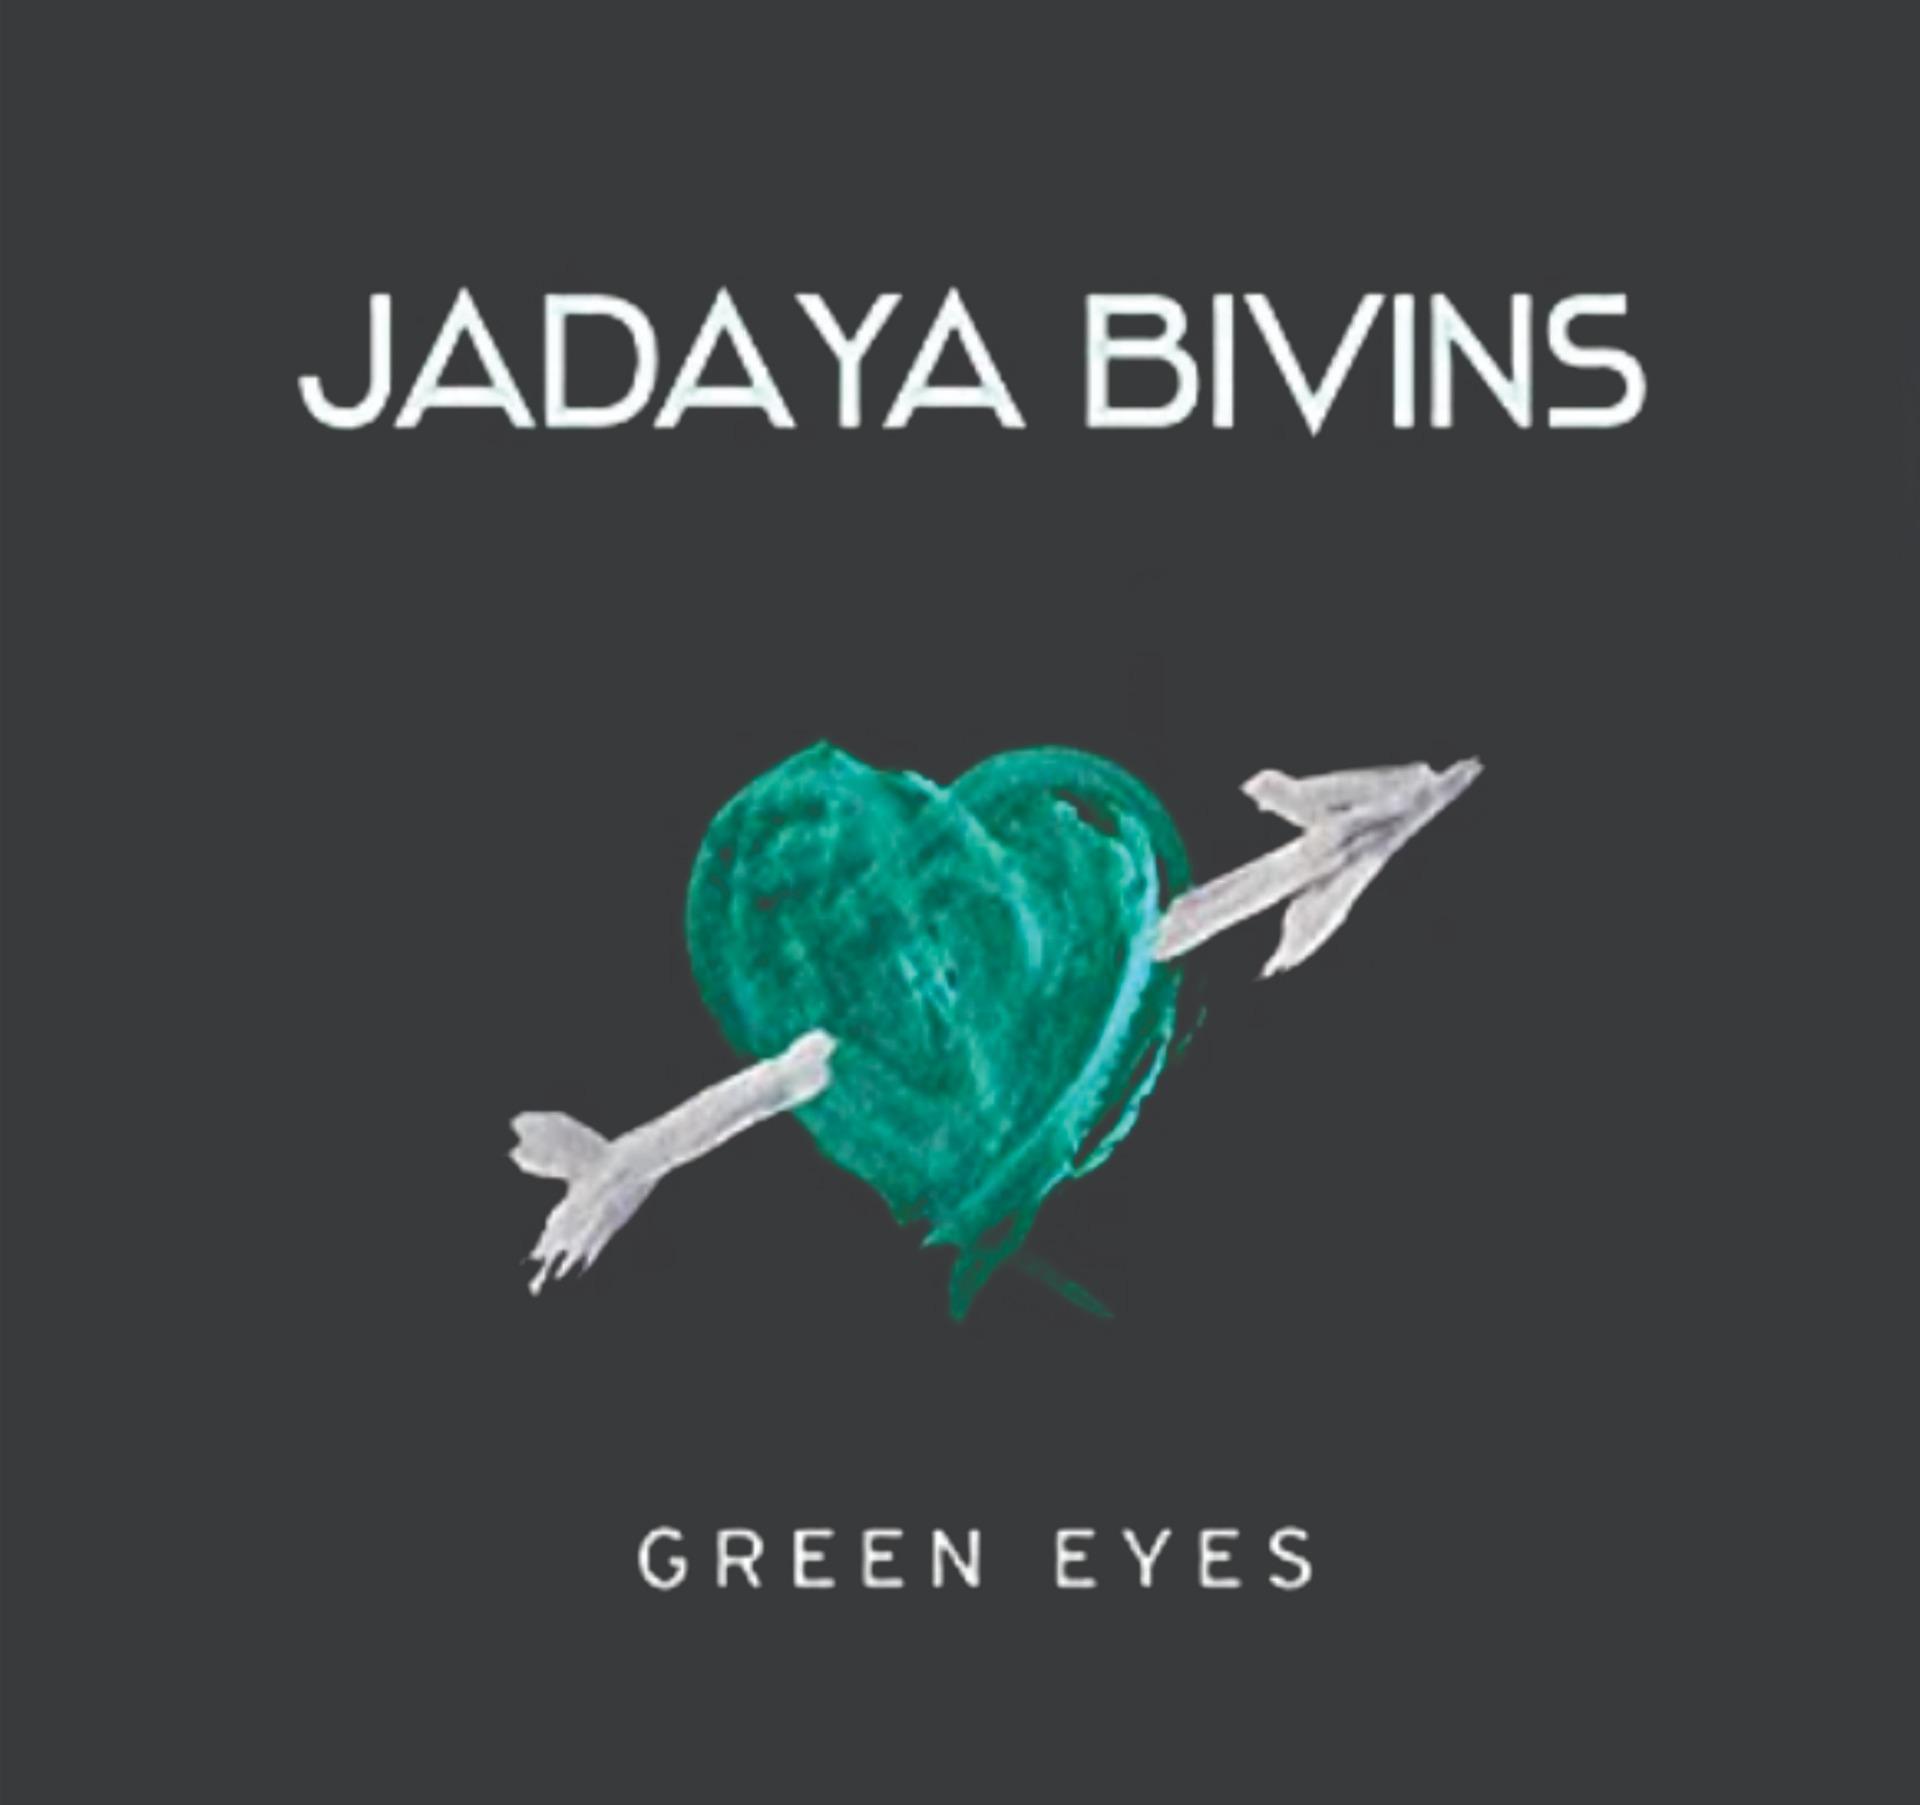 Cover art for Jadaya Bivins Song